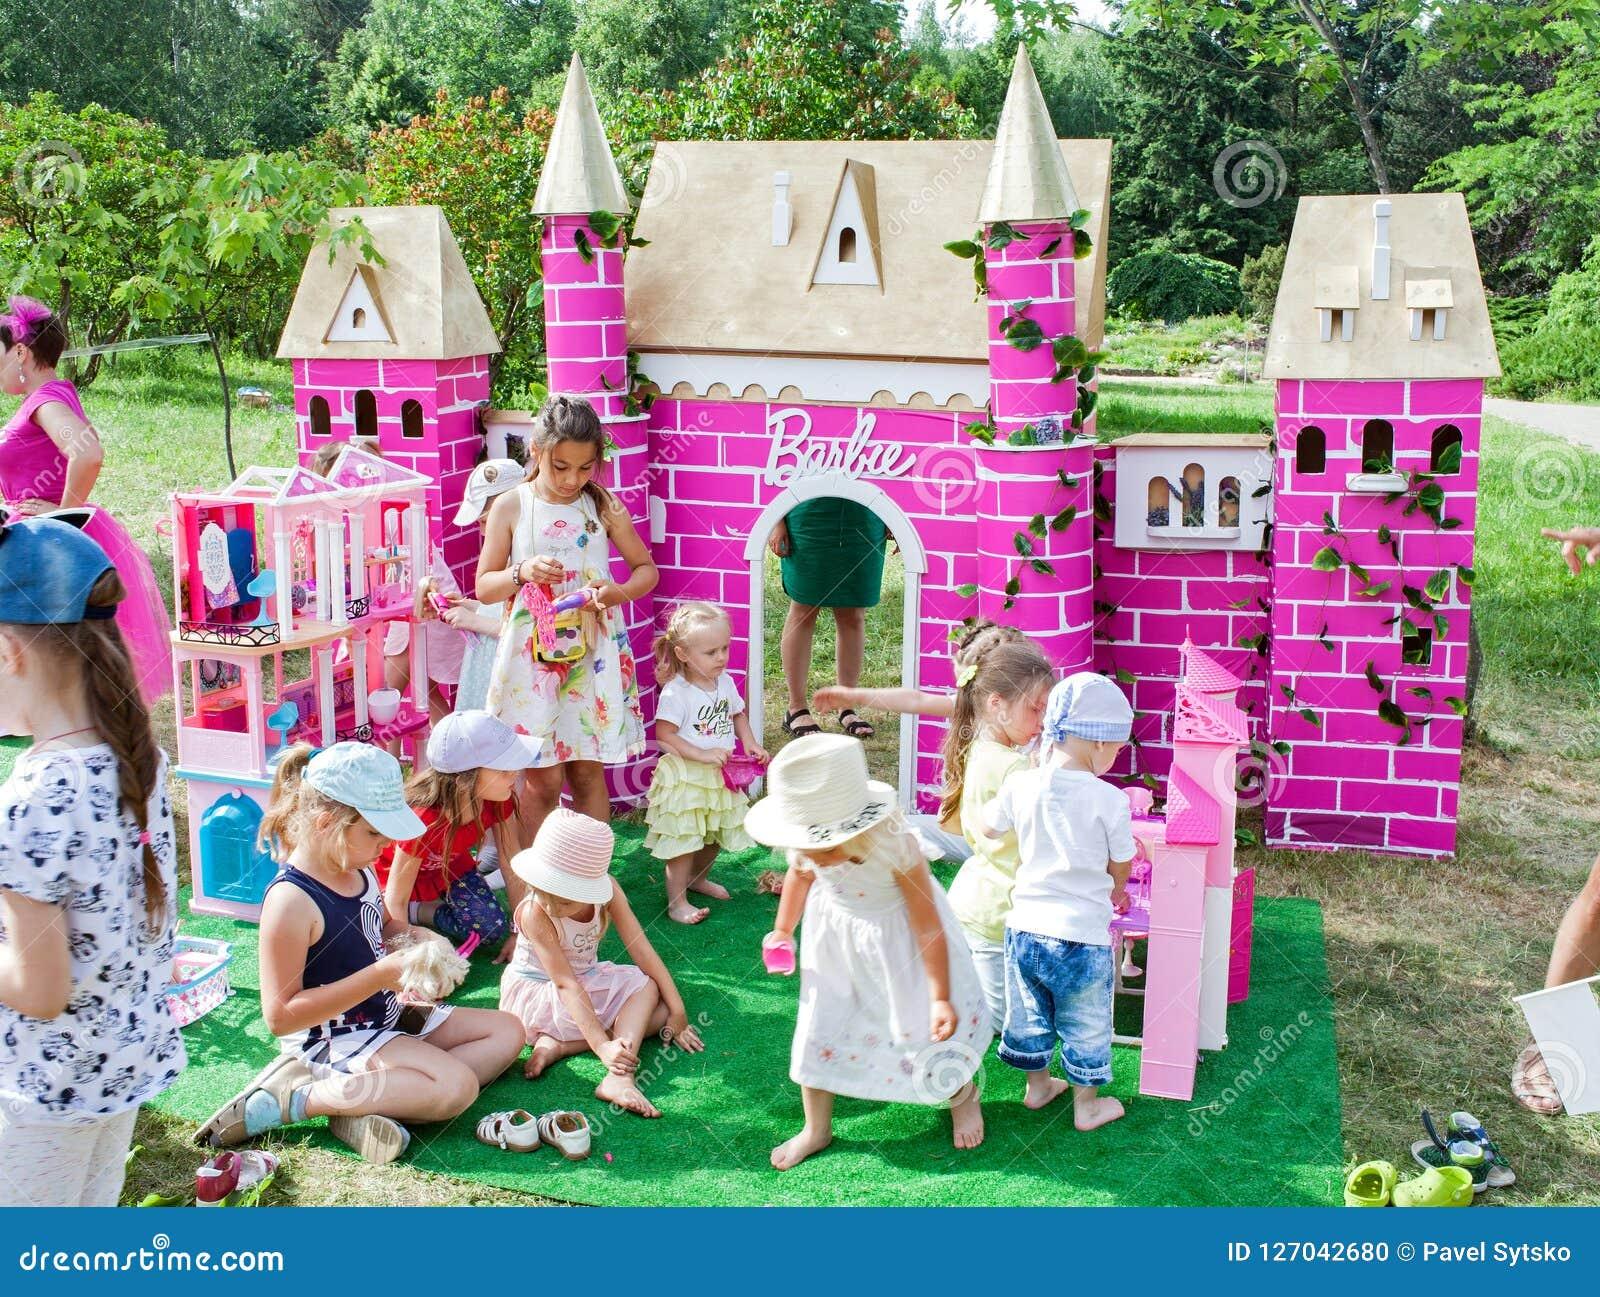 Minsk Vitryssland, Juni 3, 2018: Barnlek med dockor på lekplatsen Barbie